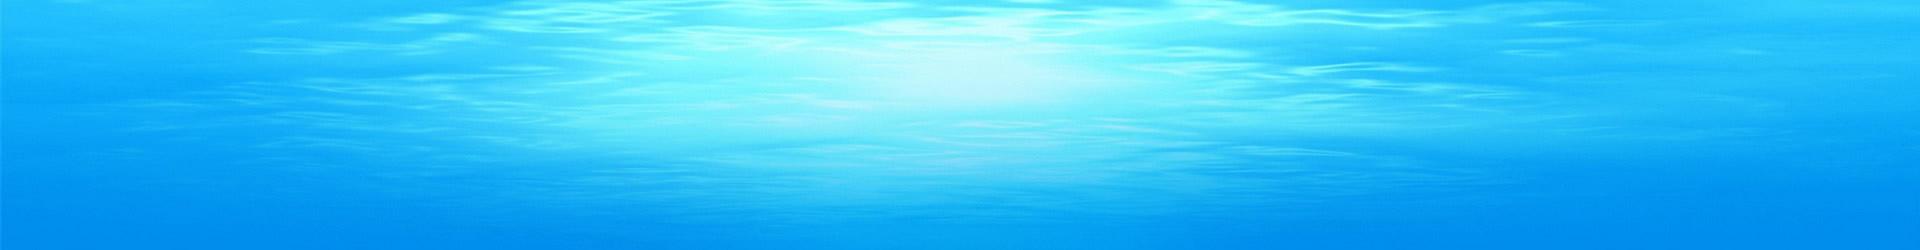 Off-shore wind lidar for wind resource assessment